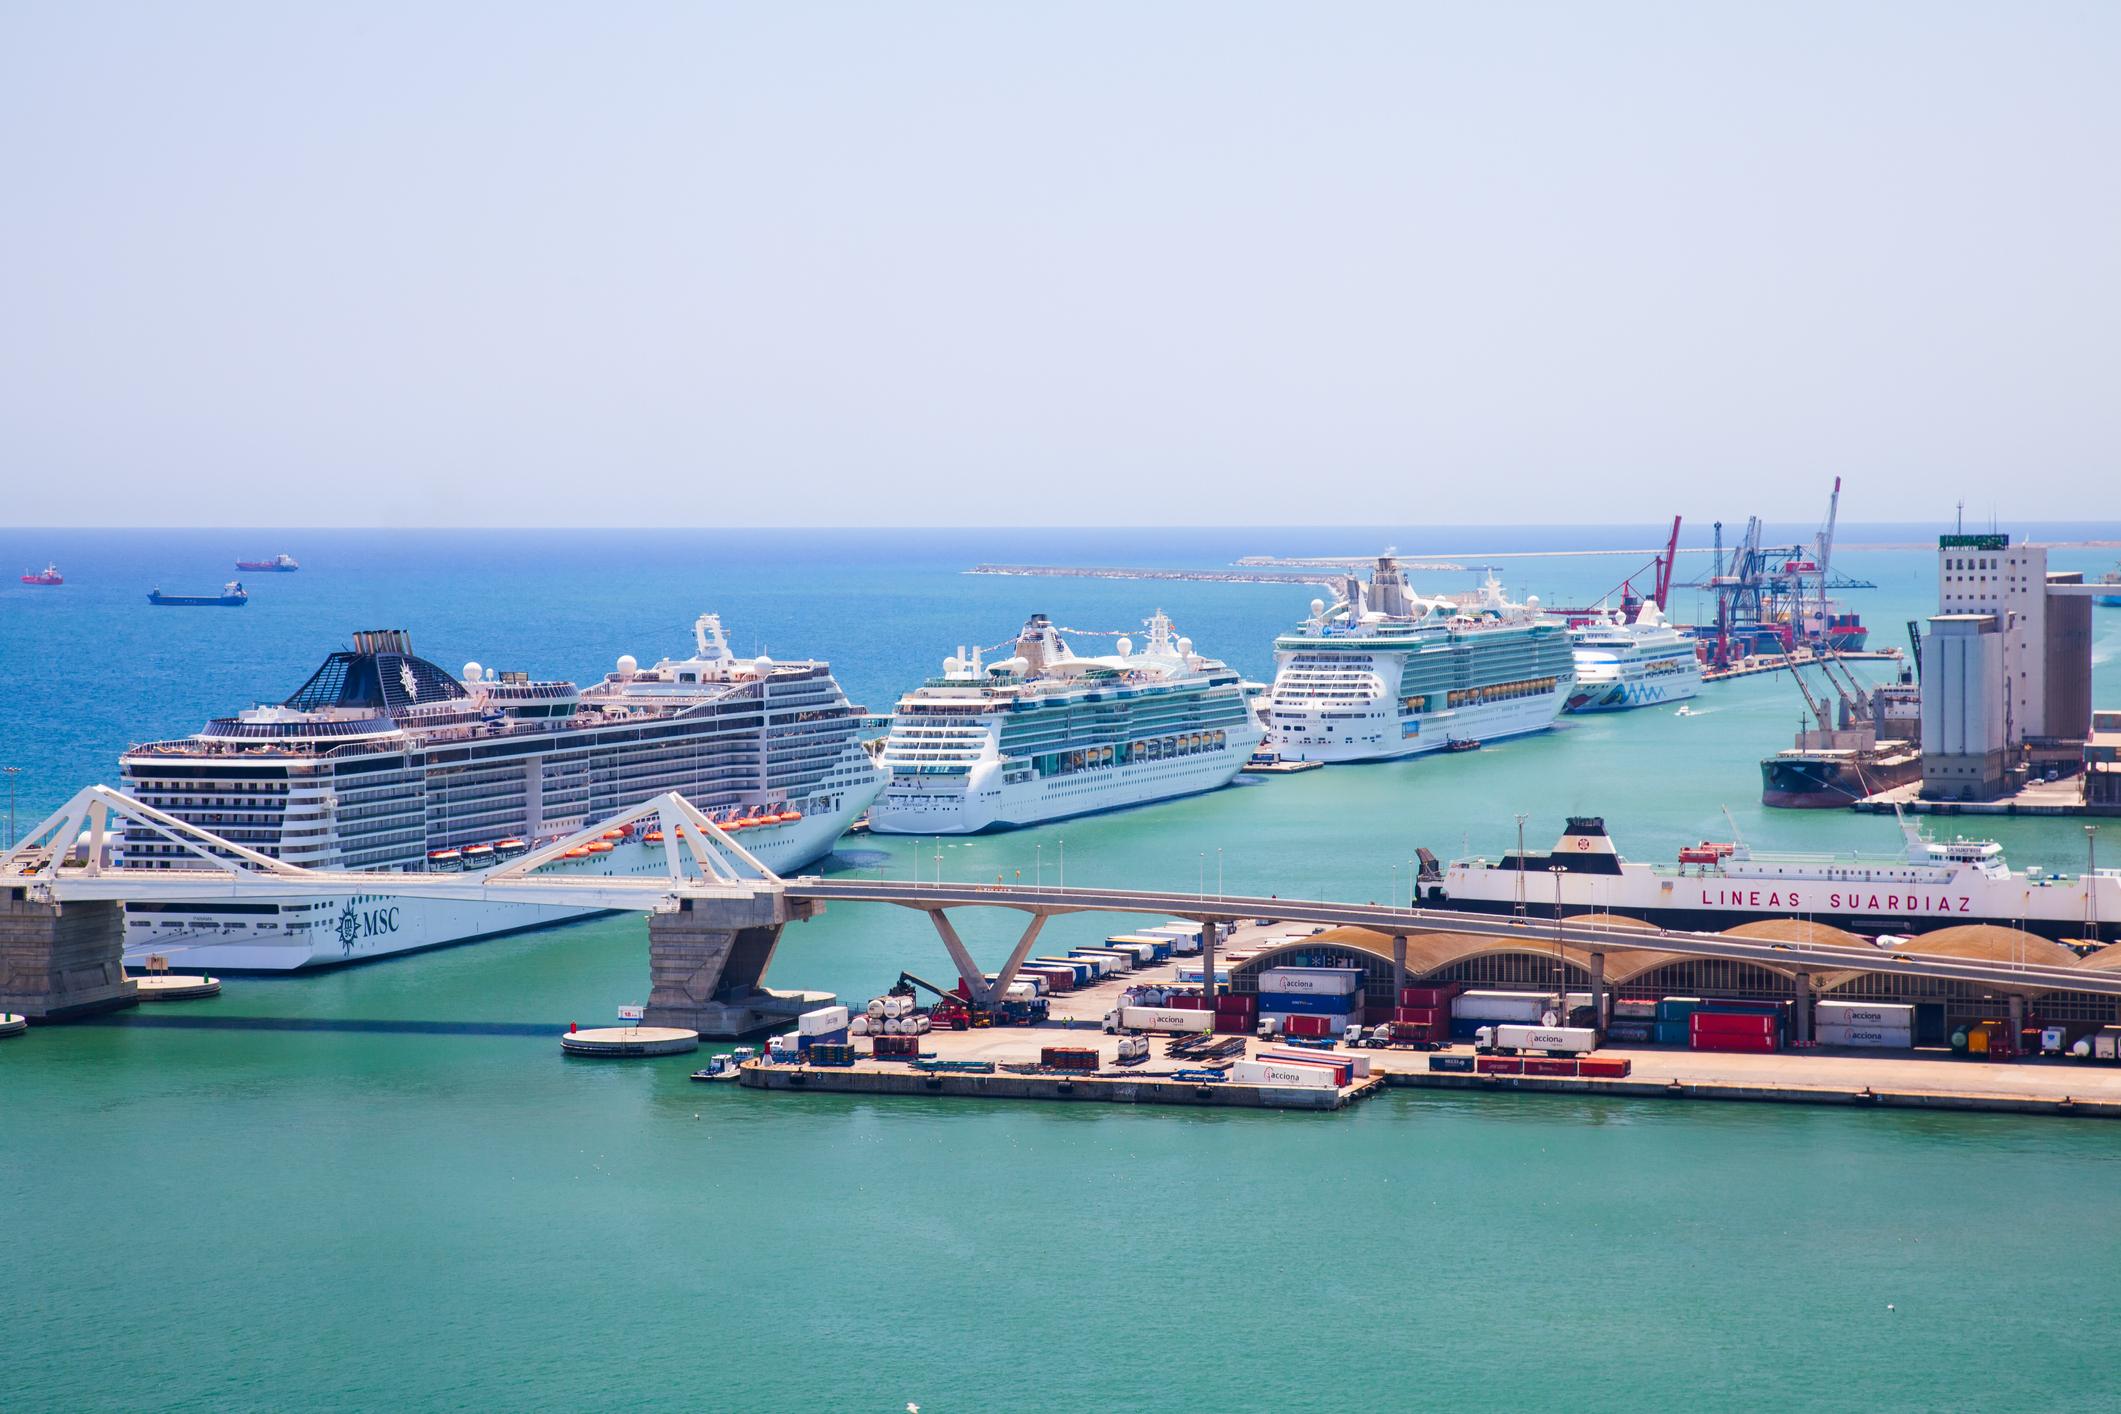 Harbor-of-Barcelona-458960741_2122x1415.jpeg